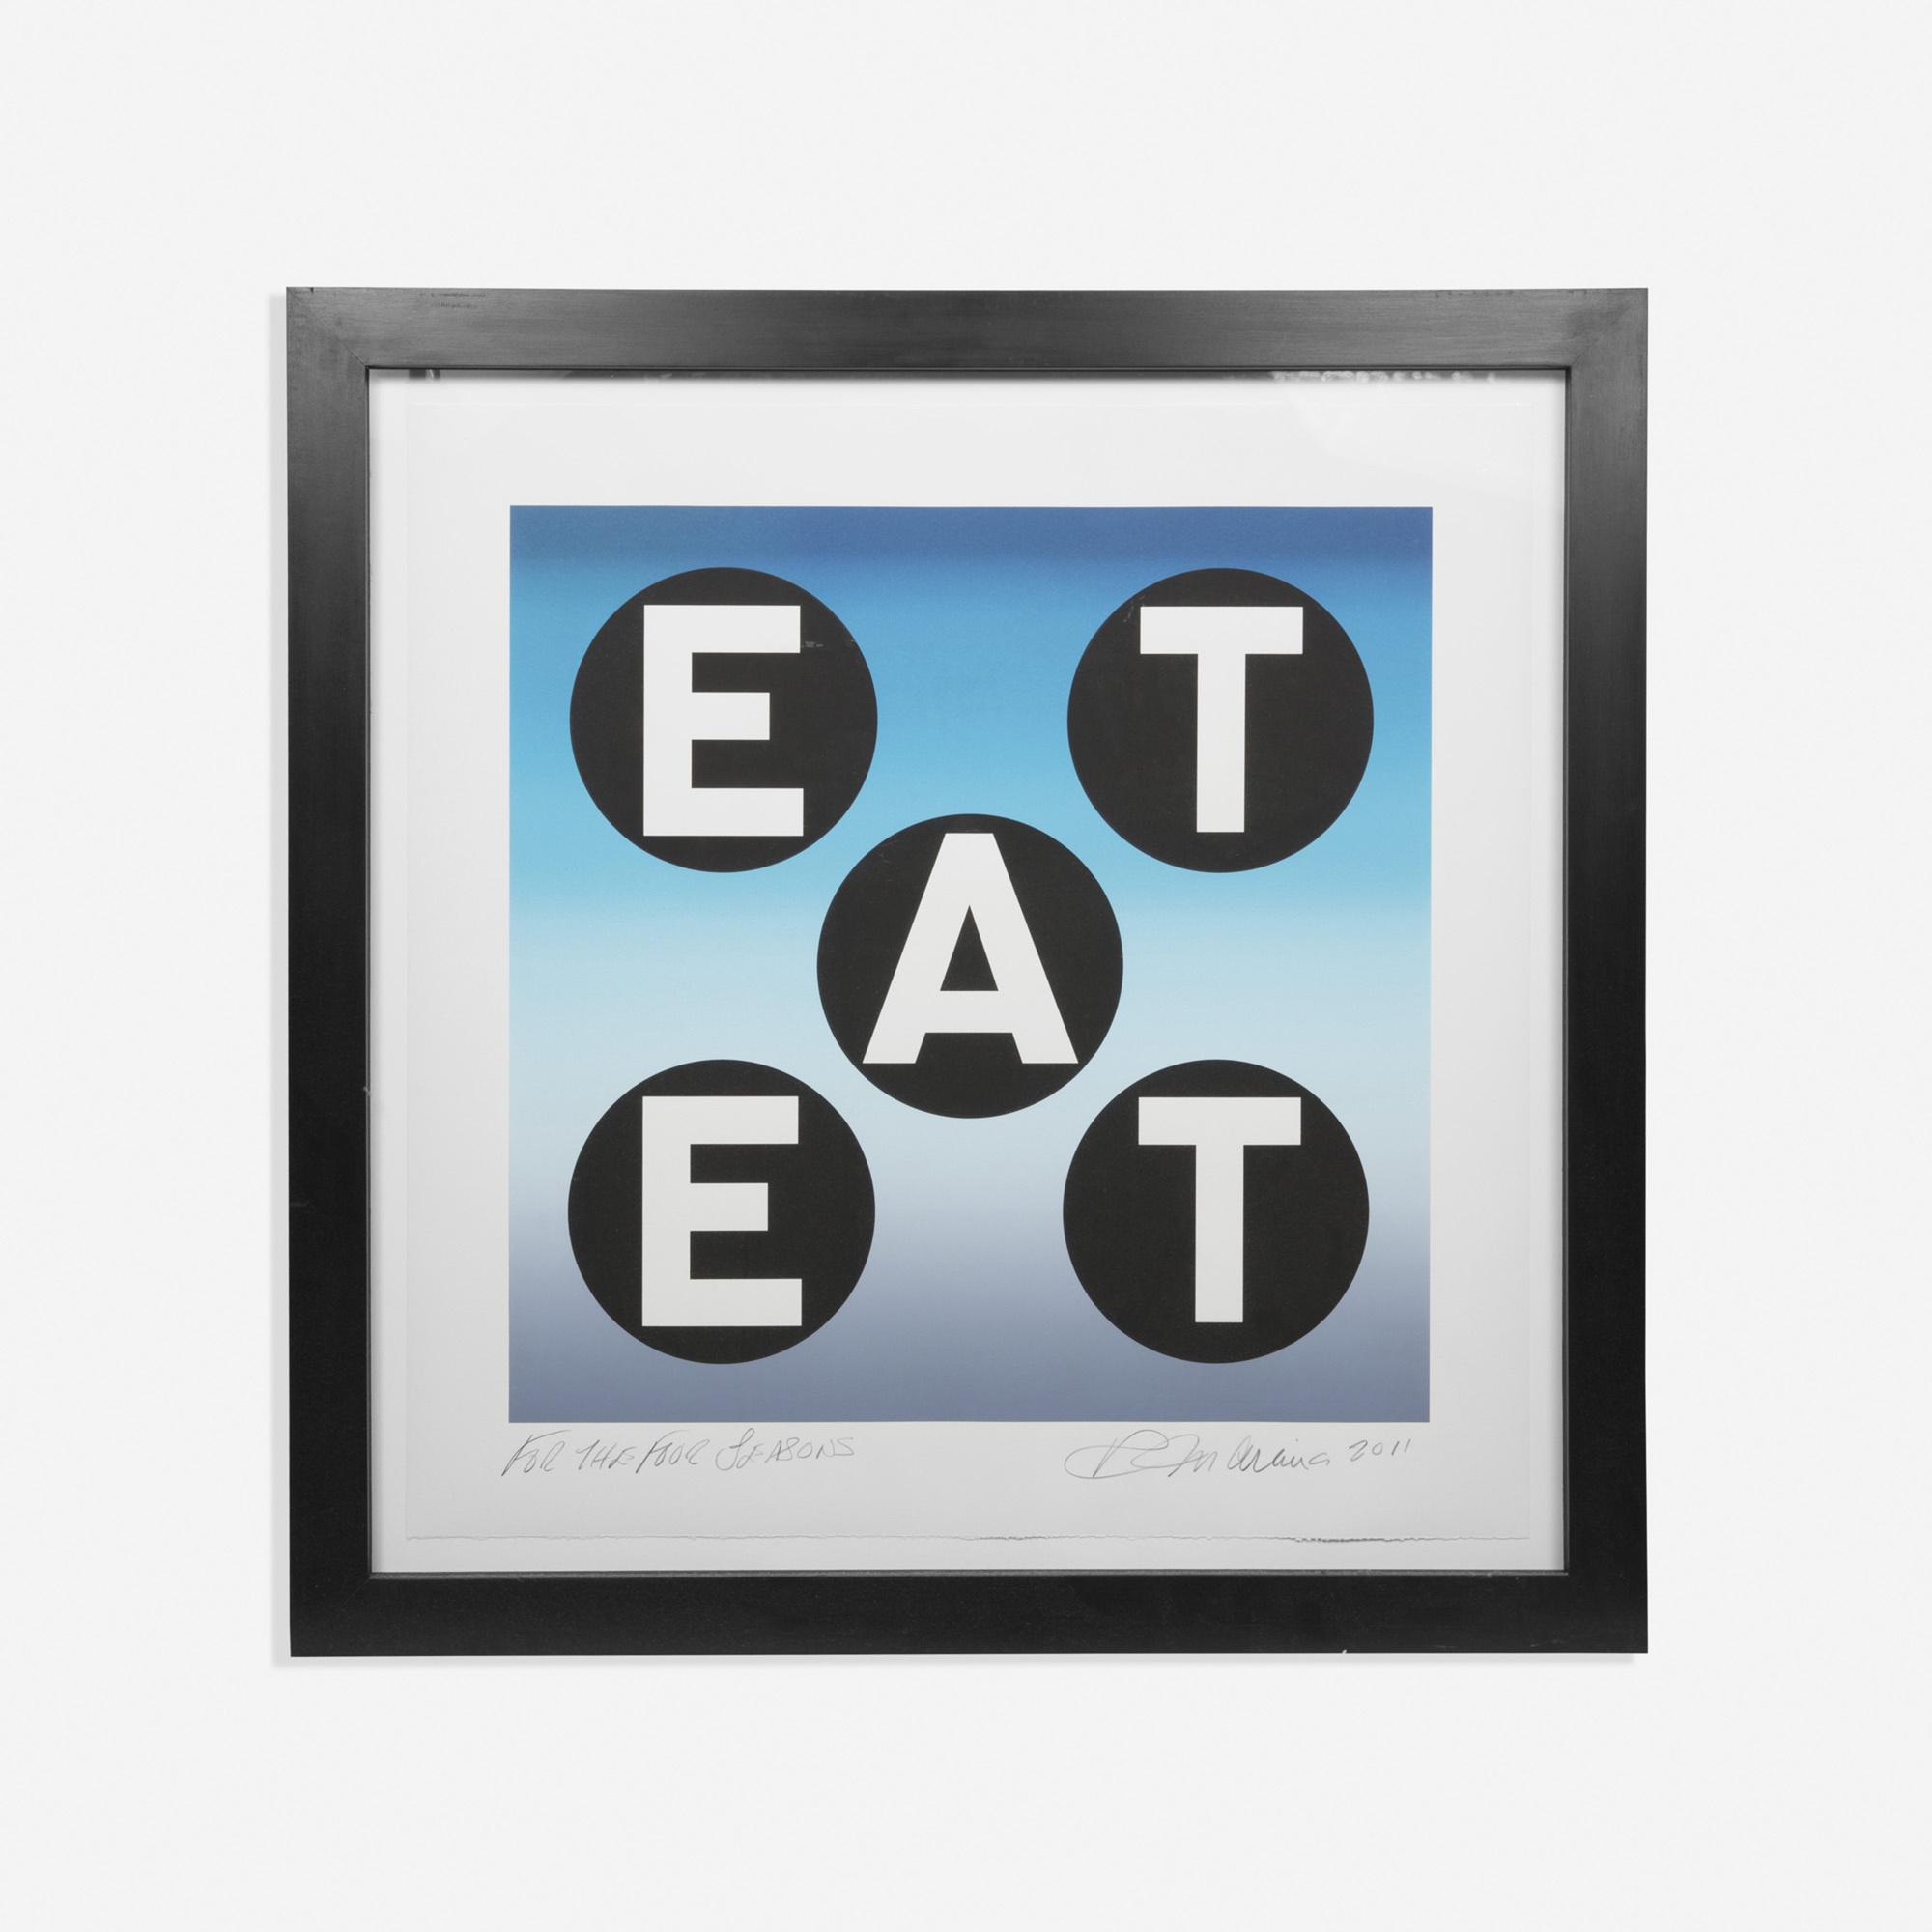 749: Robert Indiana / EAT (1 of 1)